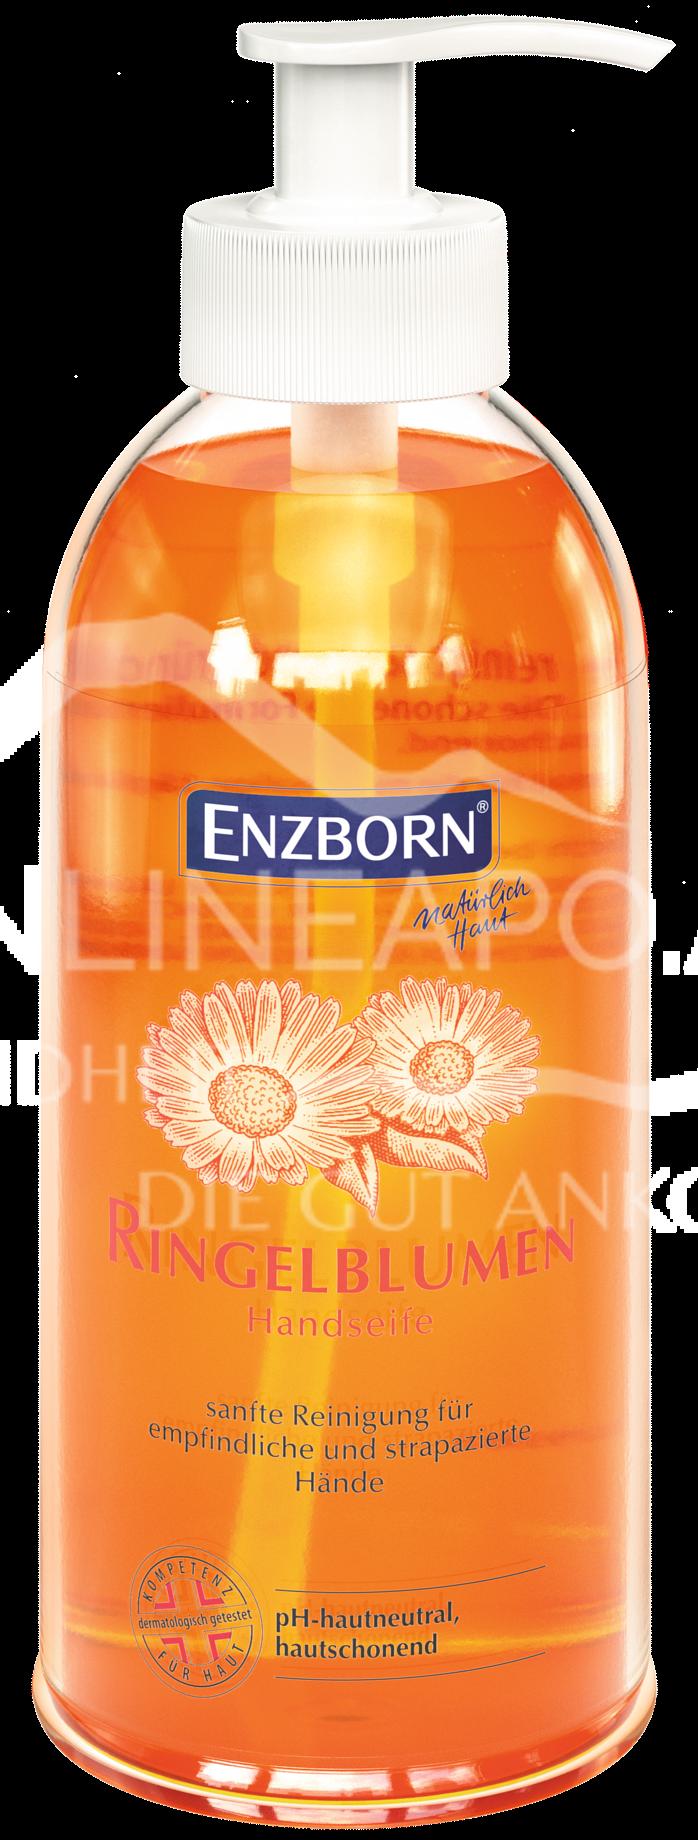 Enzborn Ringelblumen Handseife